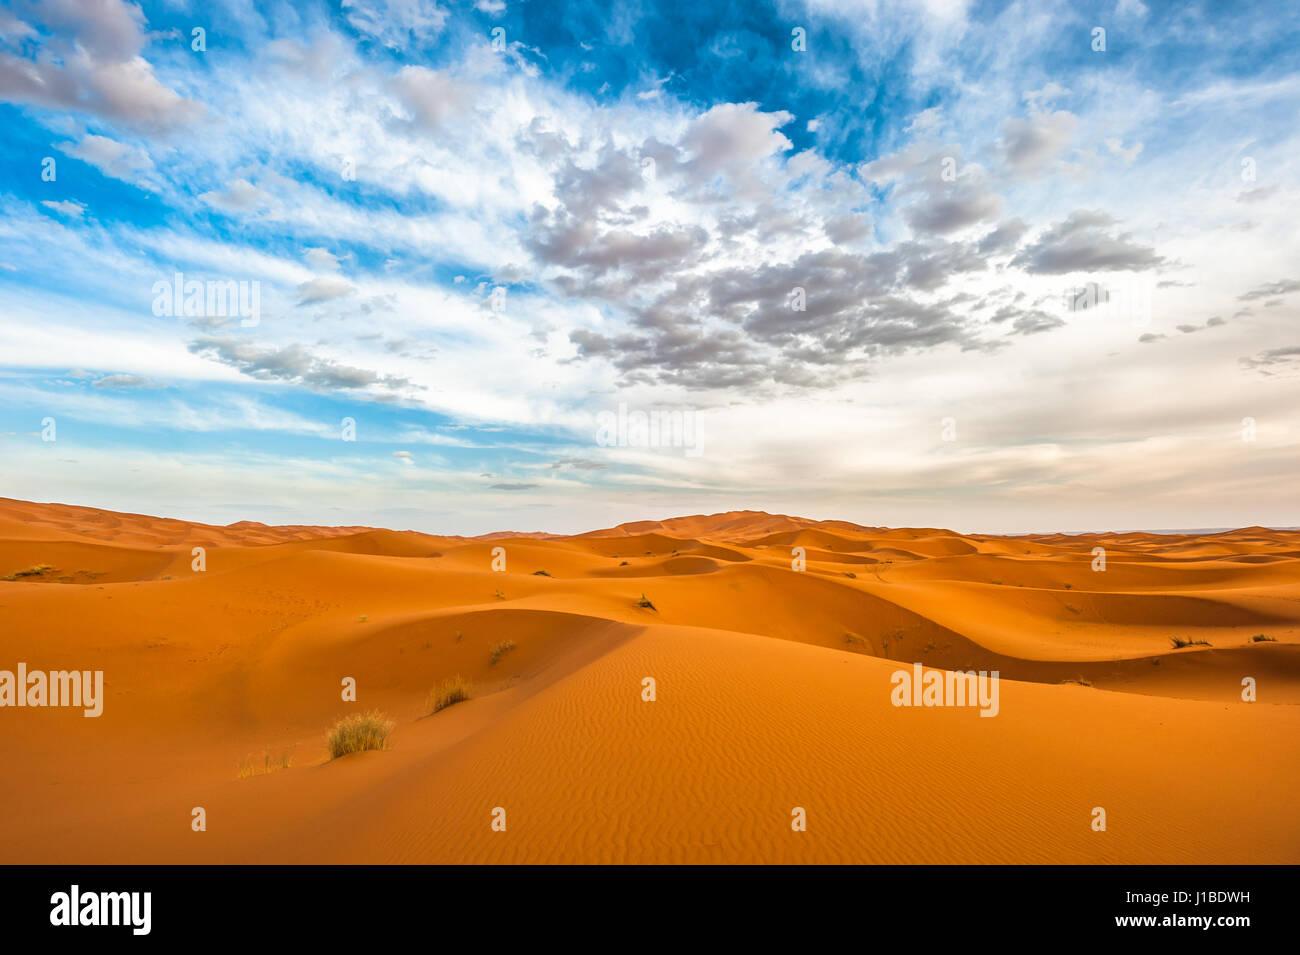 Dunes de l'Erg Chebbi, Maroc Photo Stock